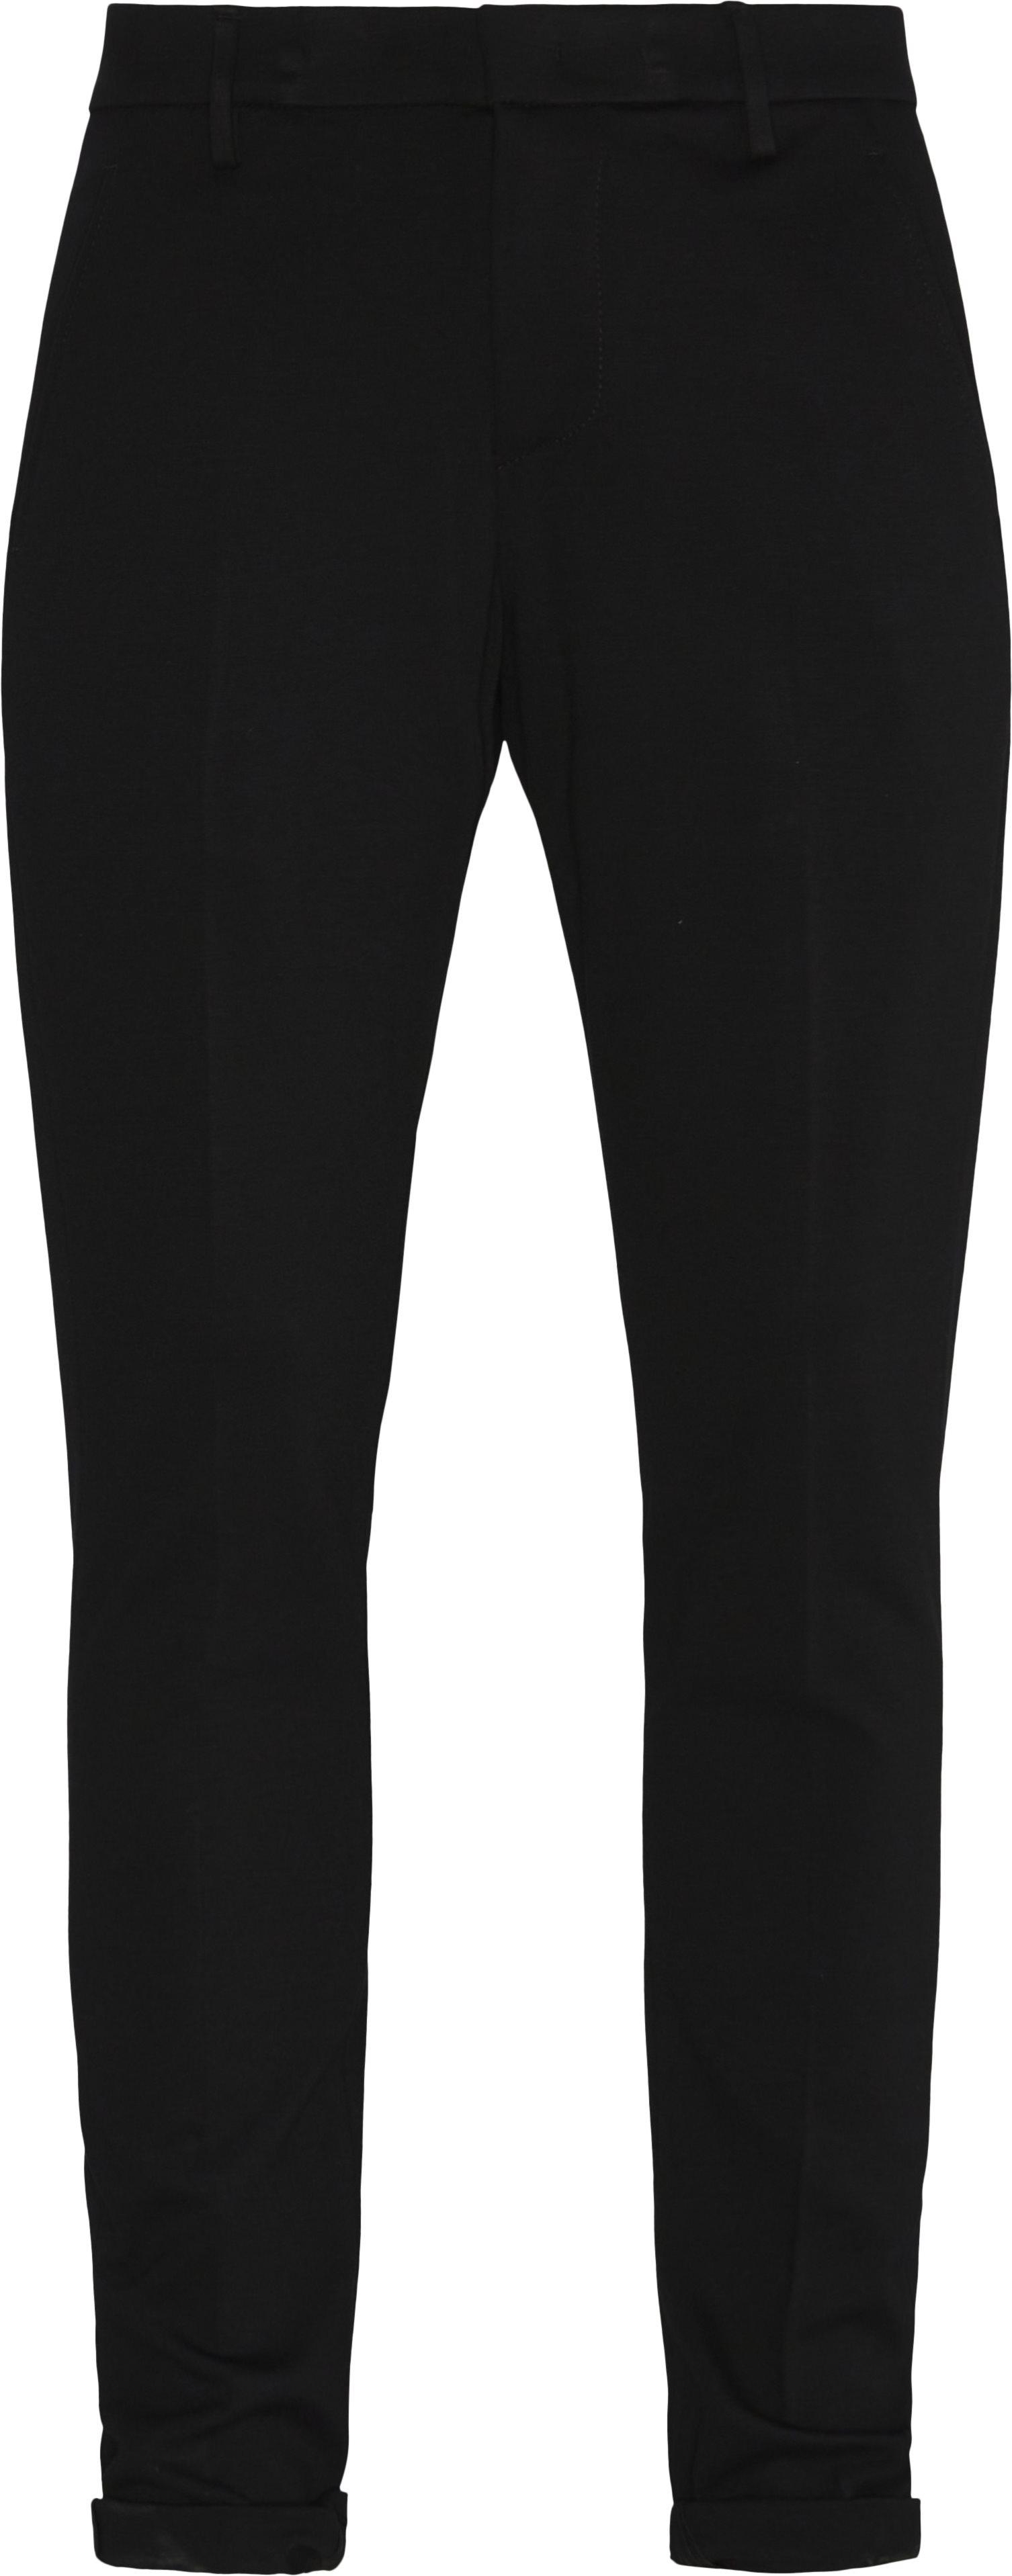 Trousers - Slim fit - Black